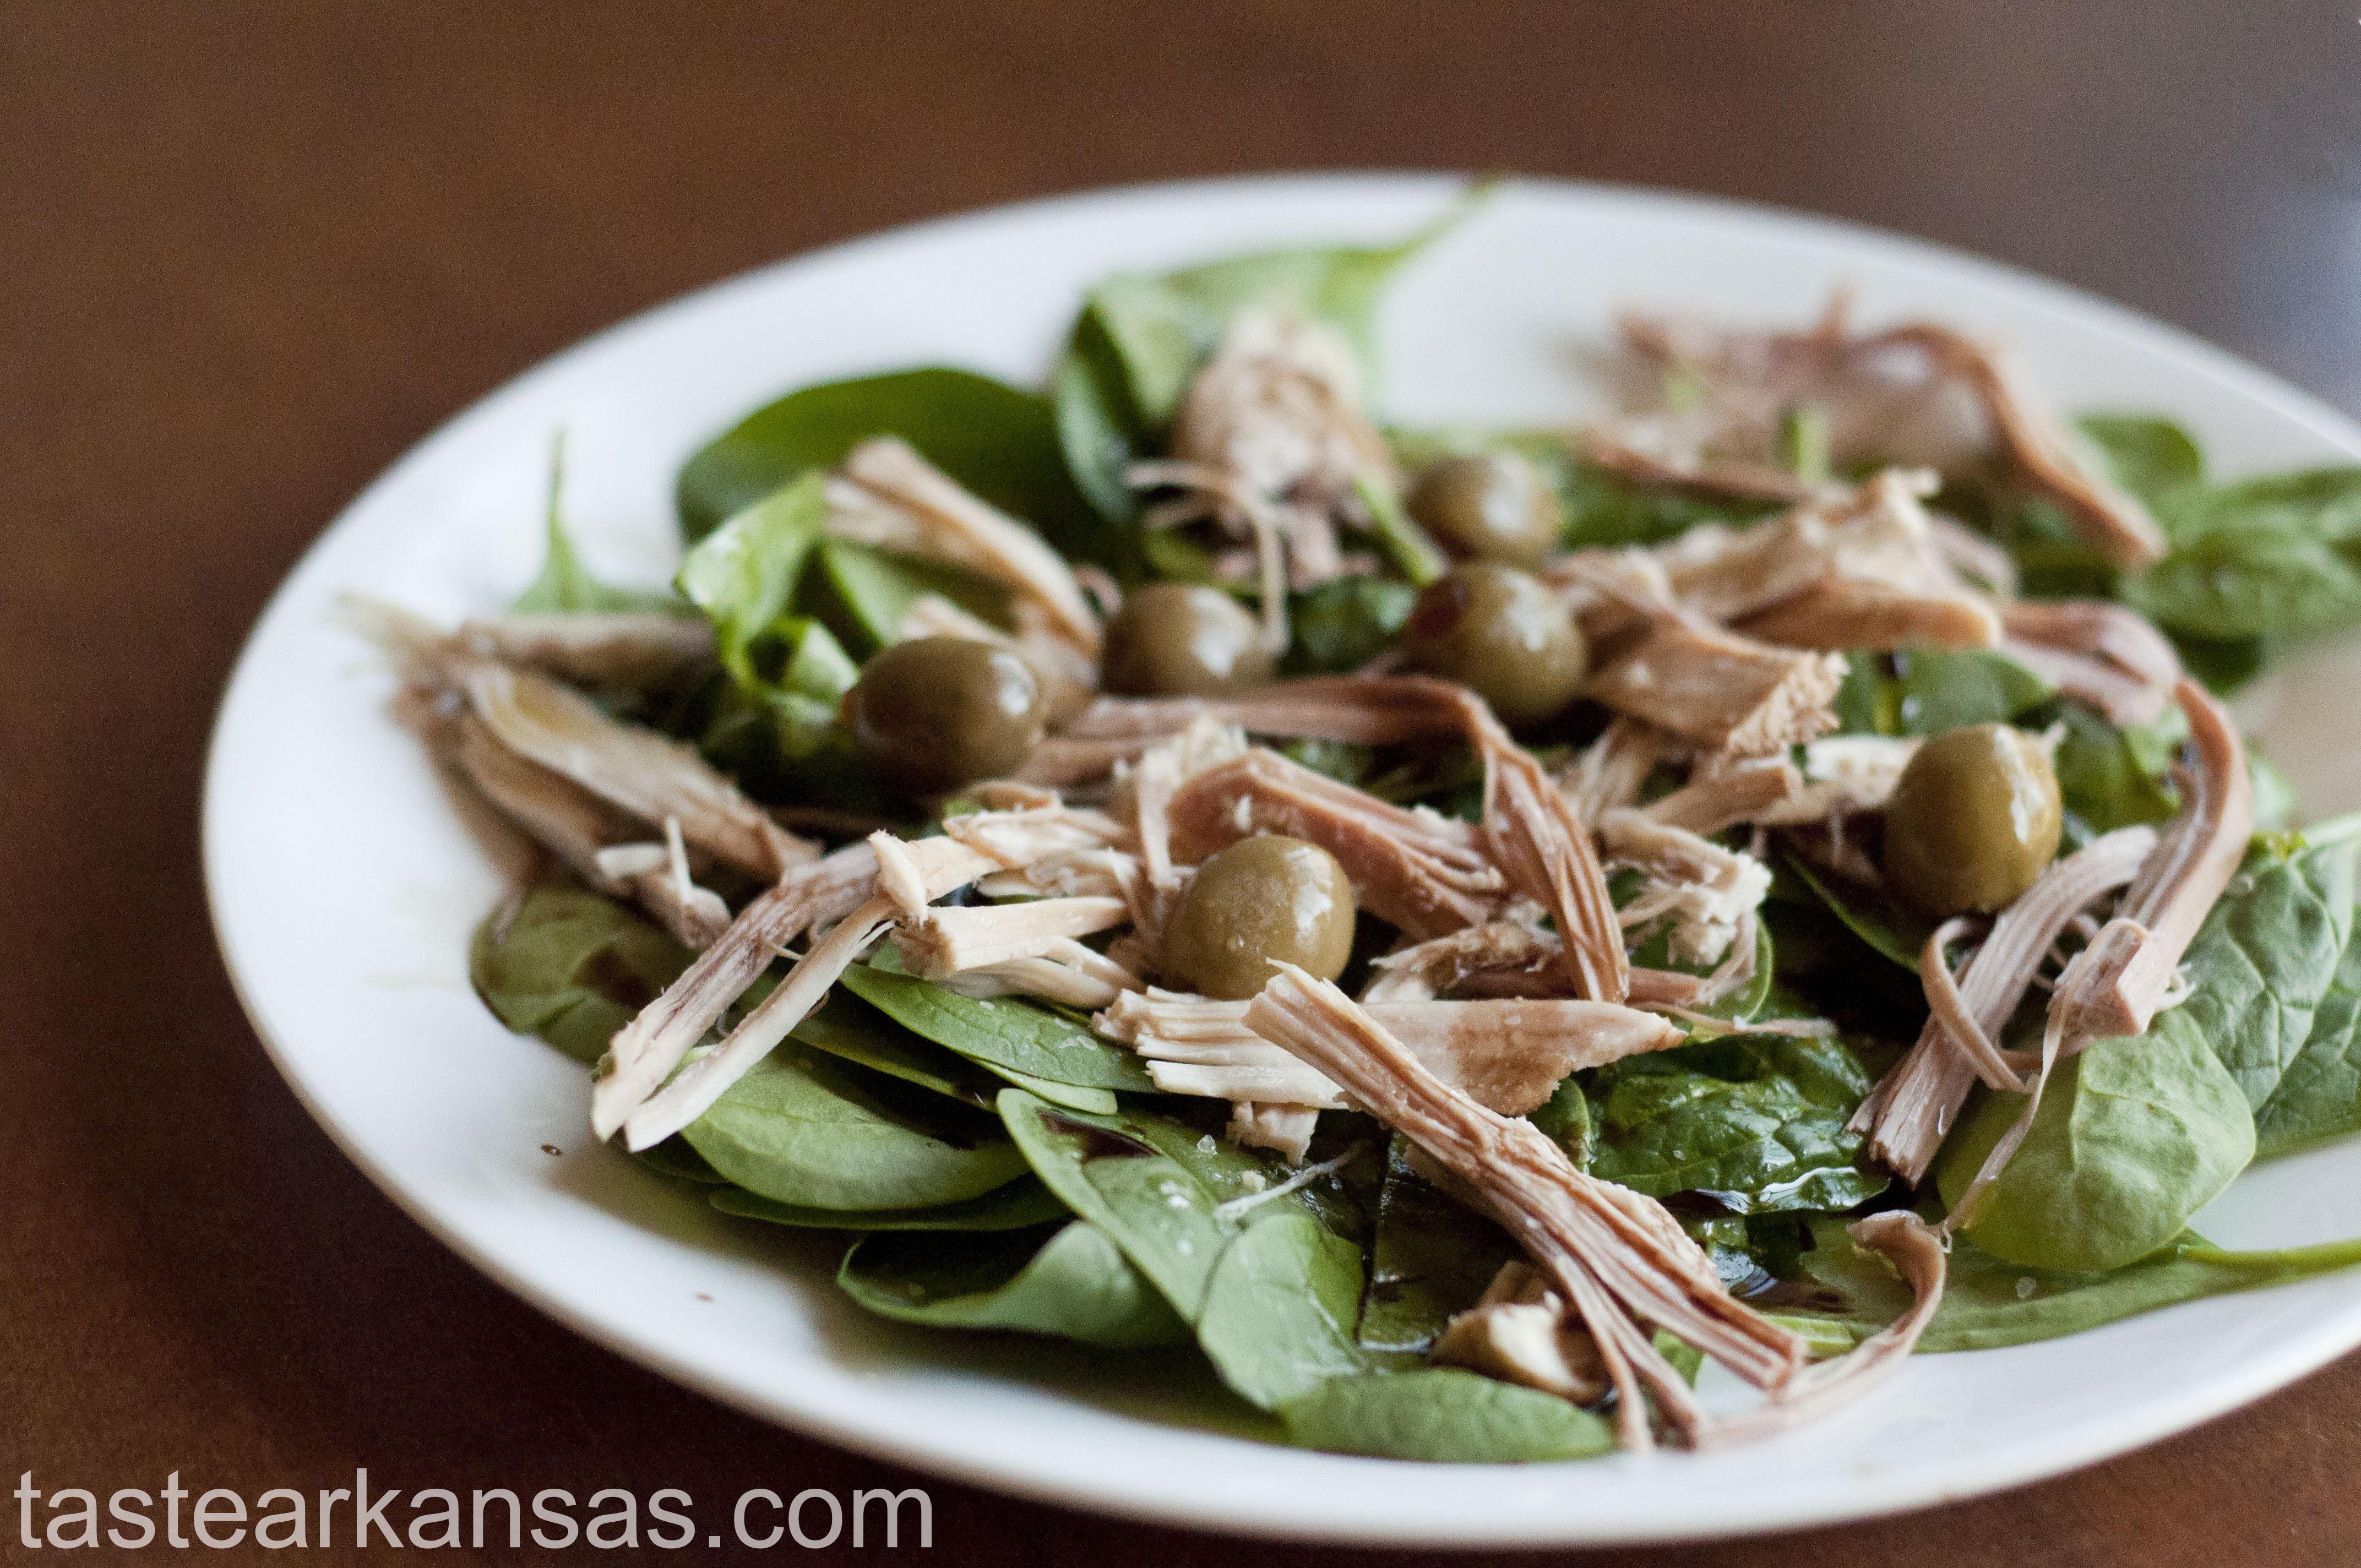 Leftover Turkey Spinach Salad